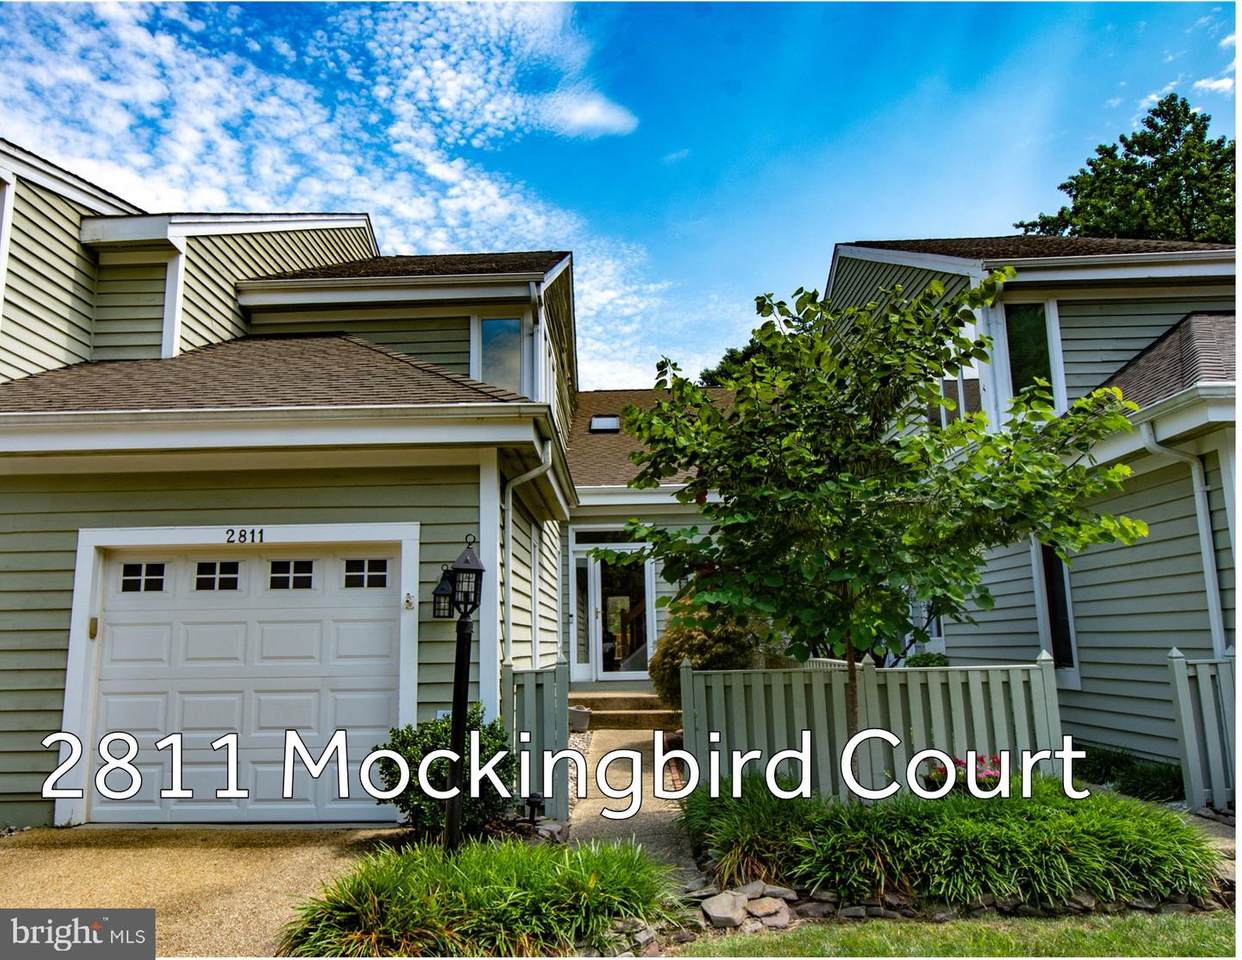 2811 Mockingbird Court - Photo 1